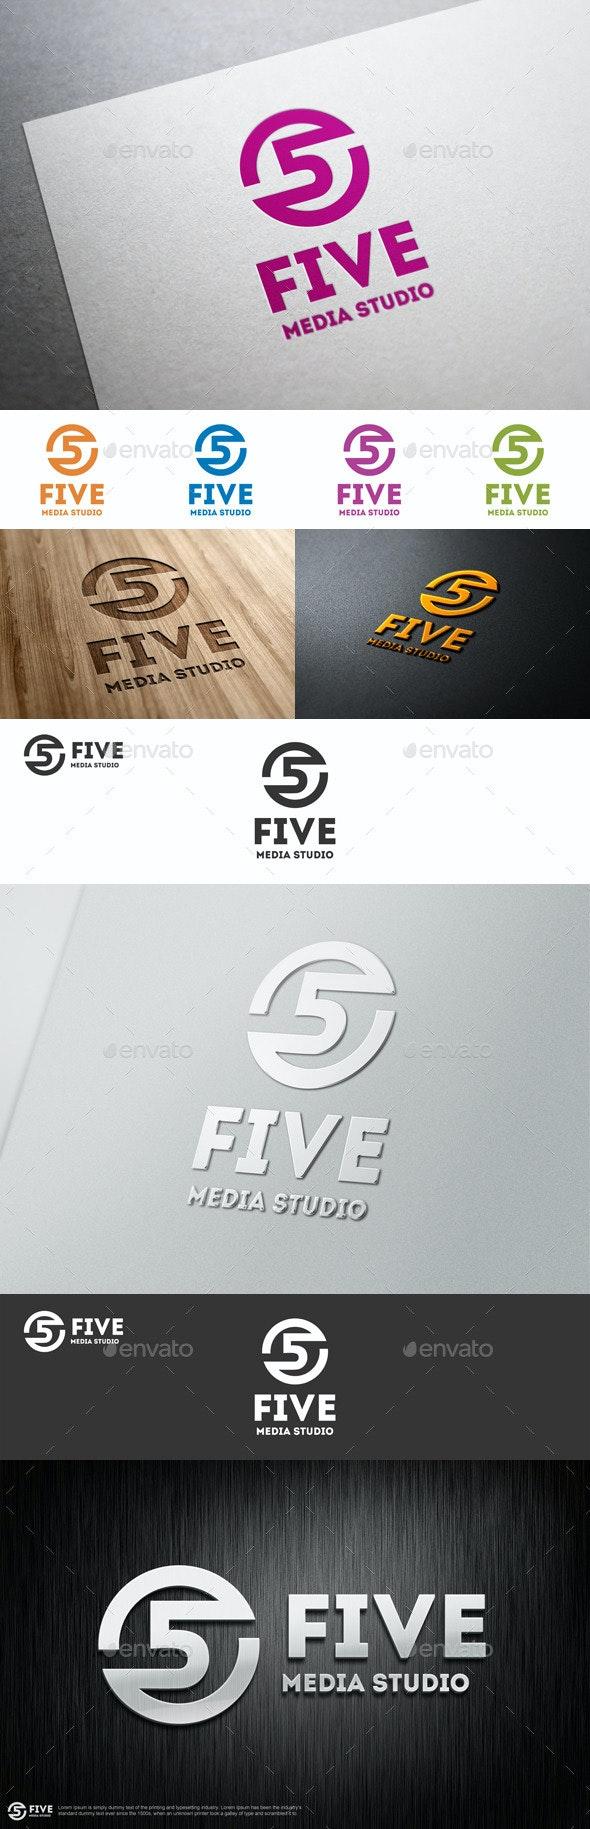 Five Media Studio Logo Template - Numbers Logo Templates